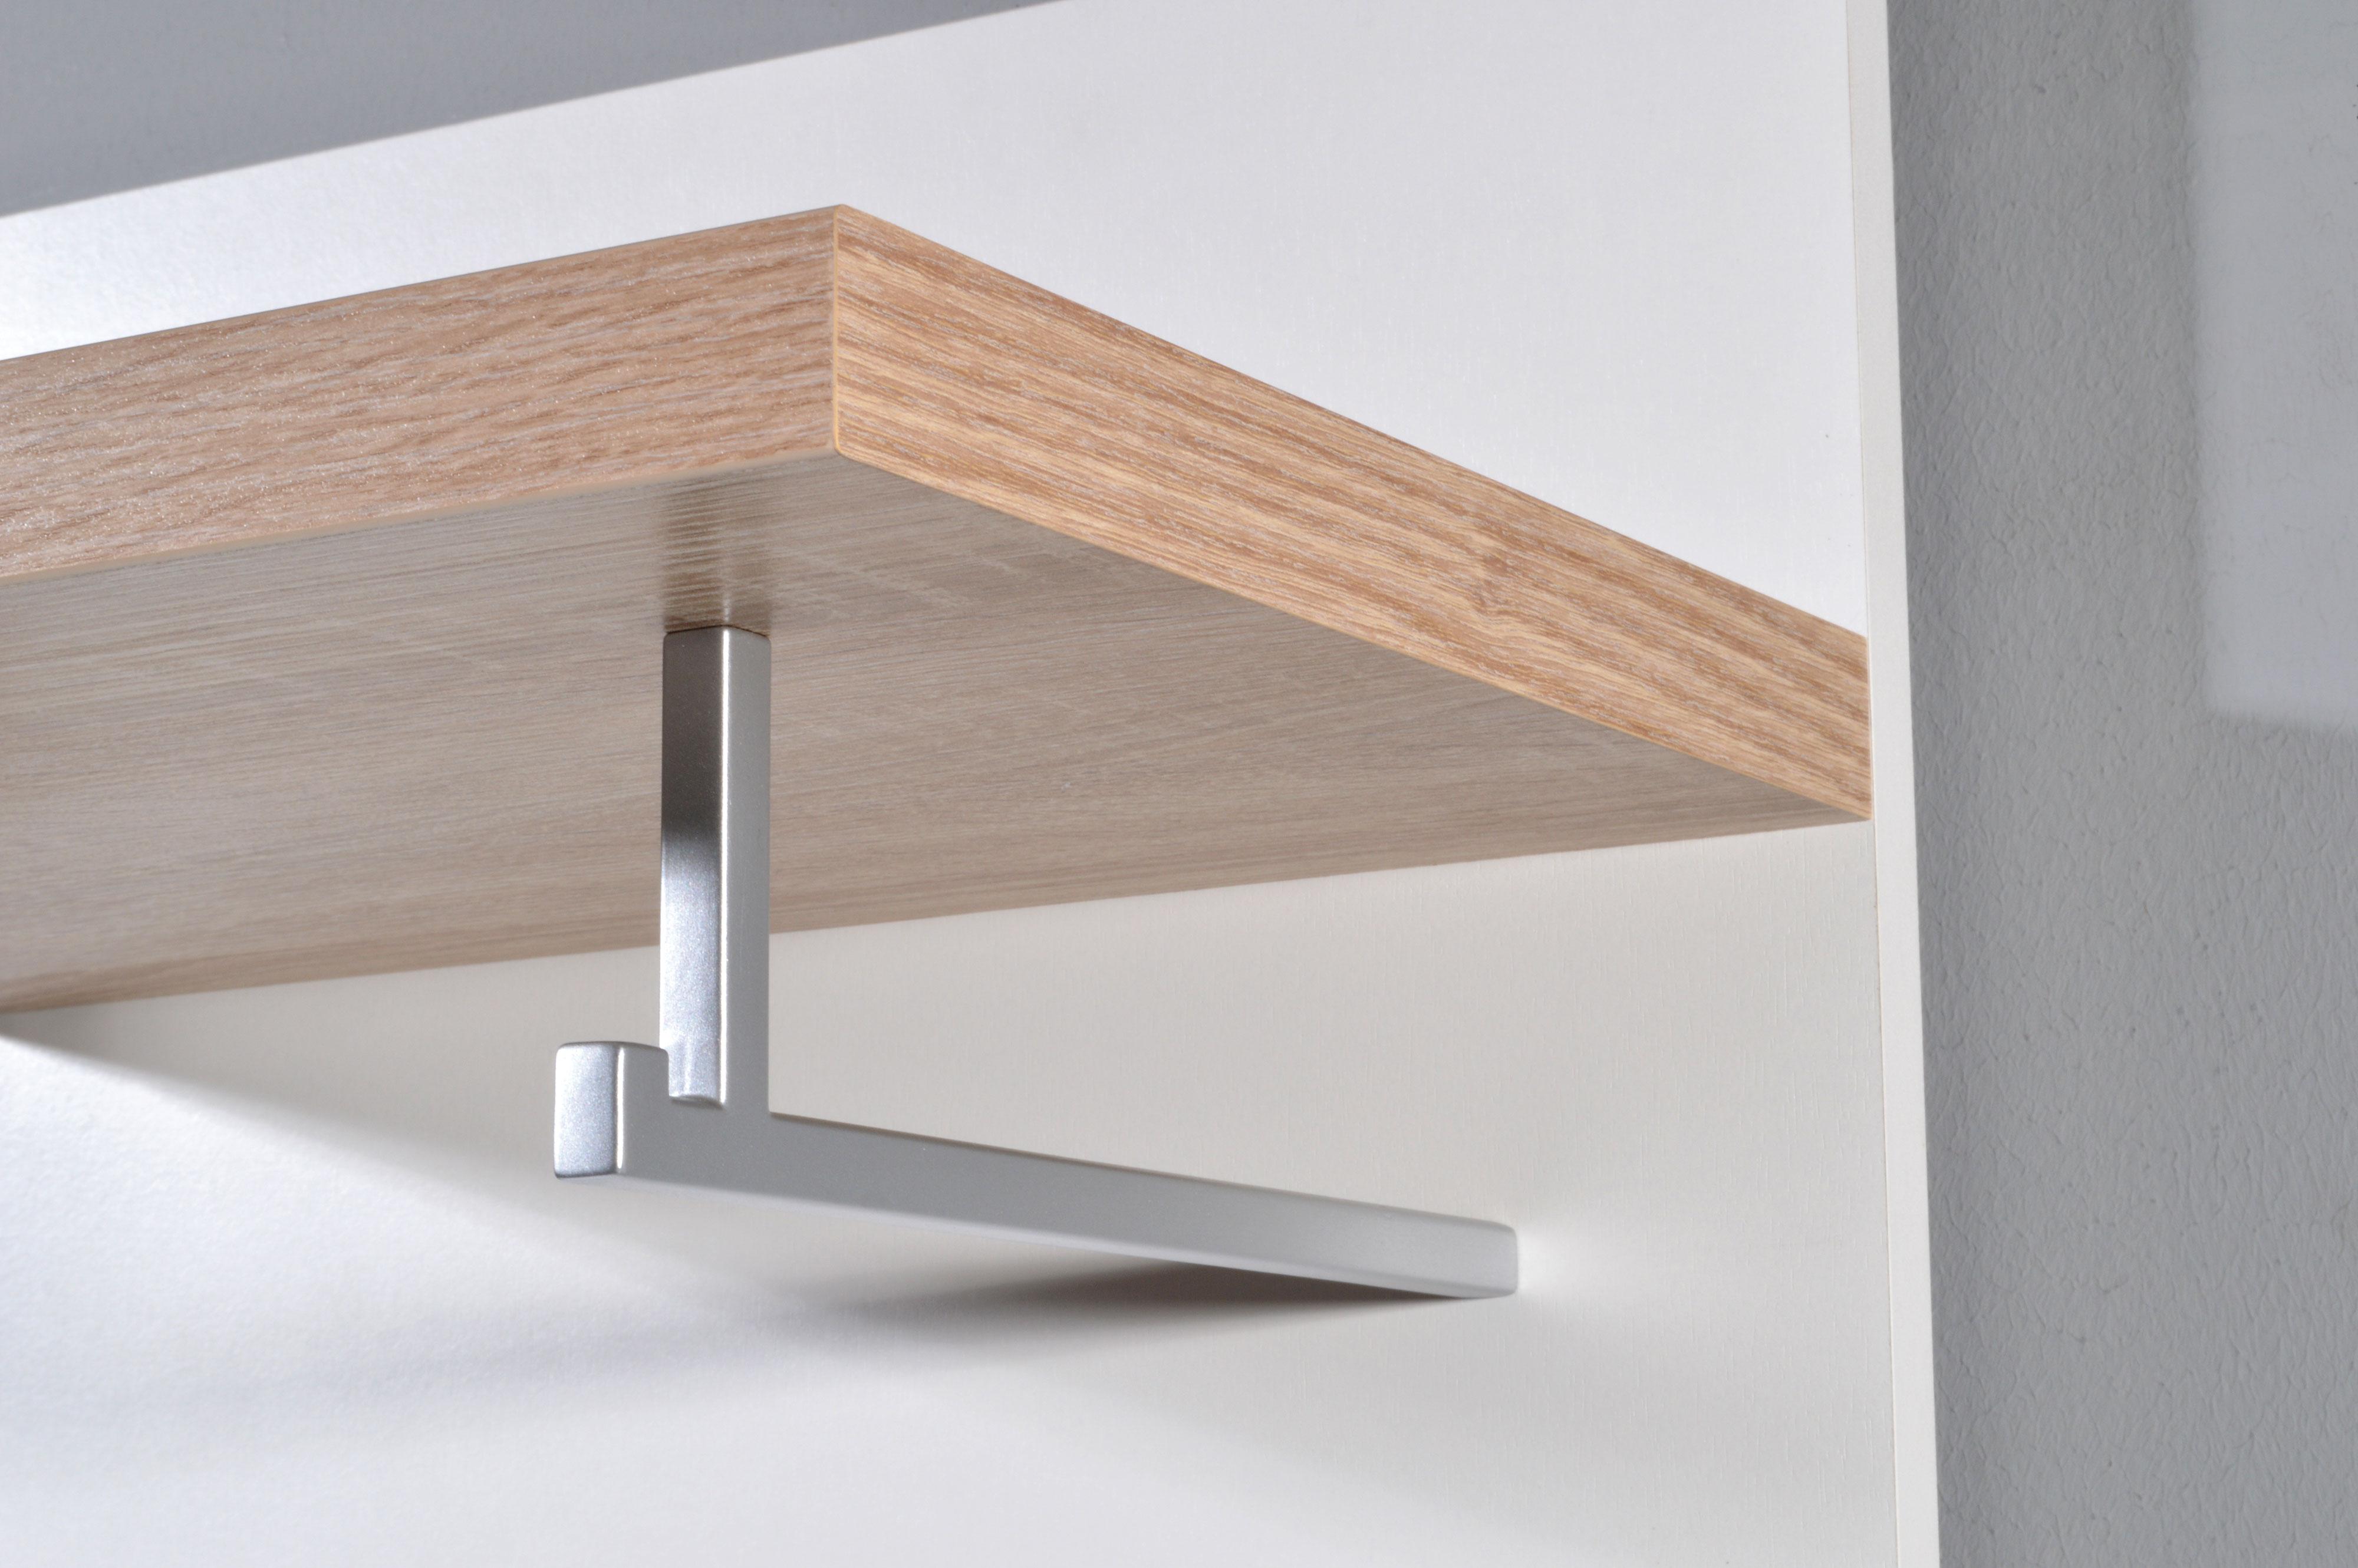 kompaktgarderobe garderobe flurm bel diele mod gm612 weiss sonoma eiche ebay. Black Bedroom Furniture Sets. Home Design Ideas